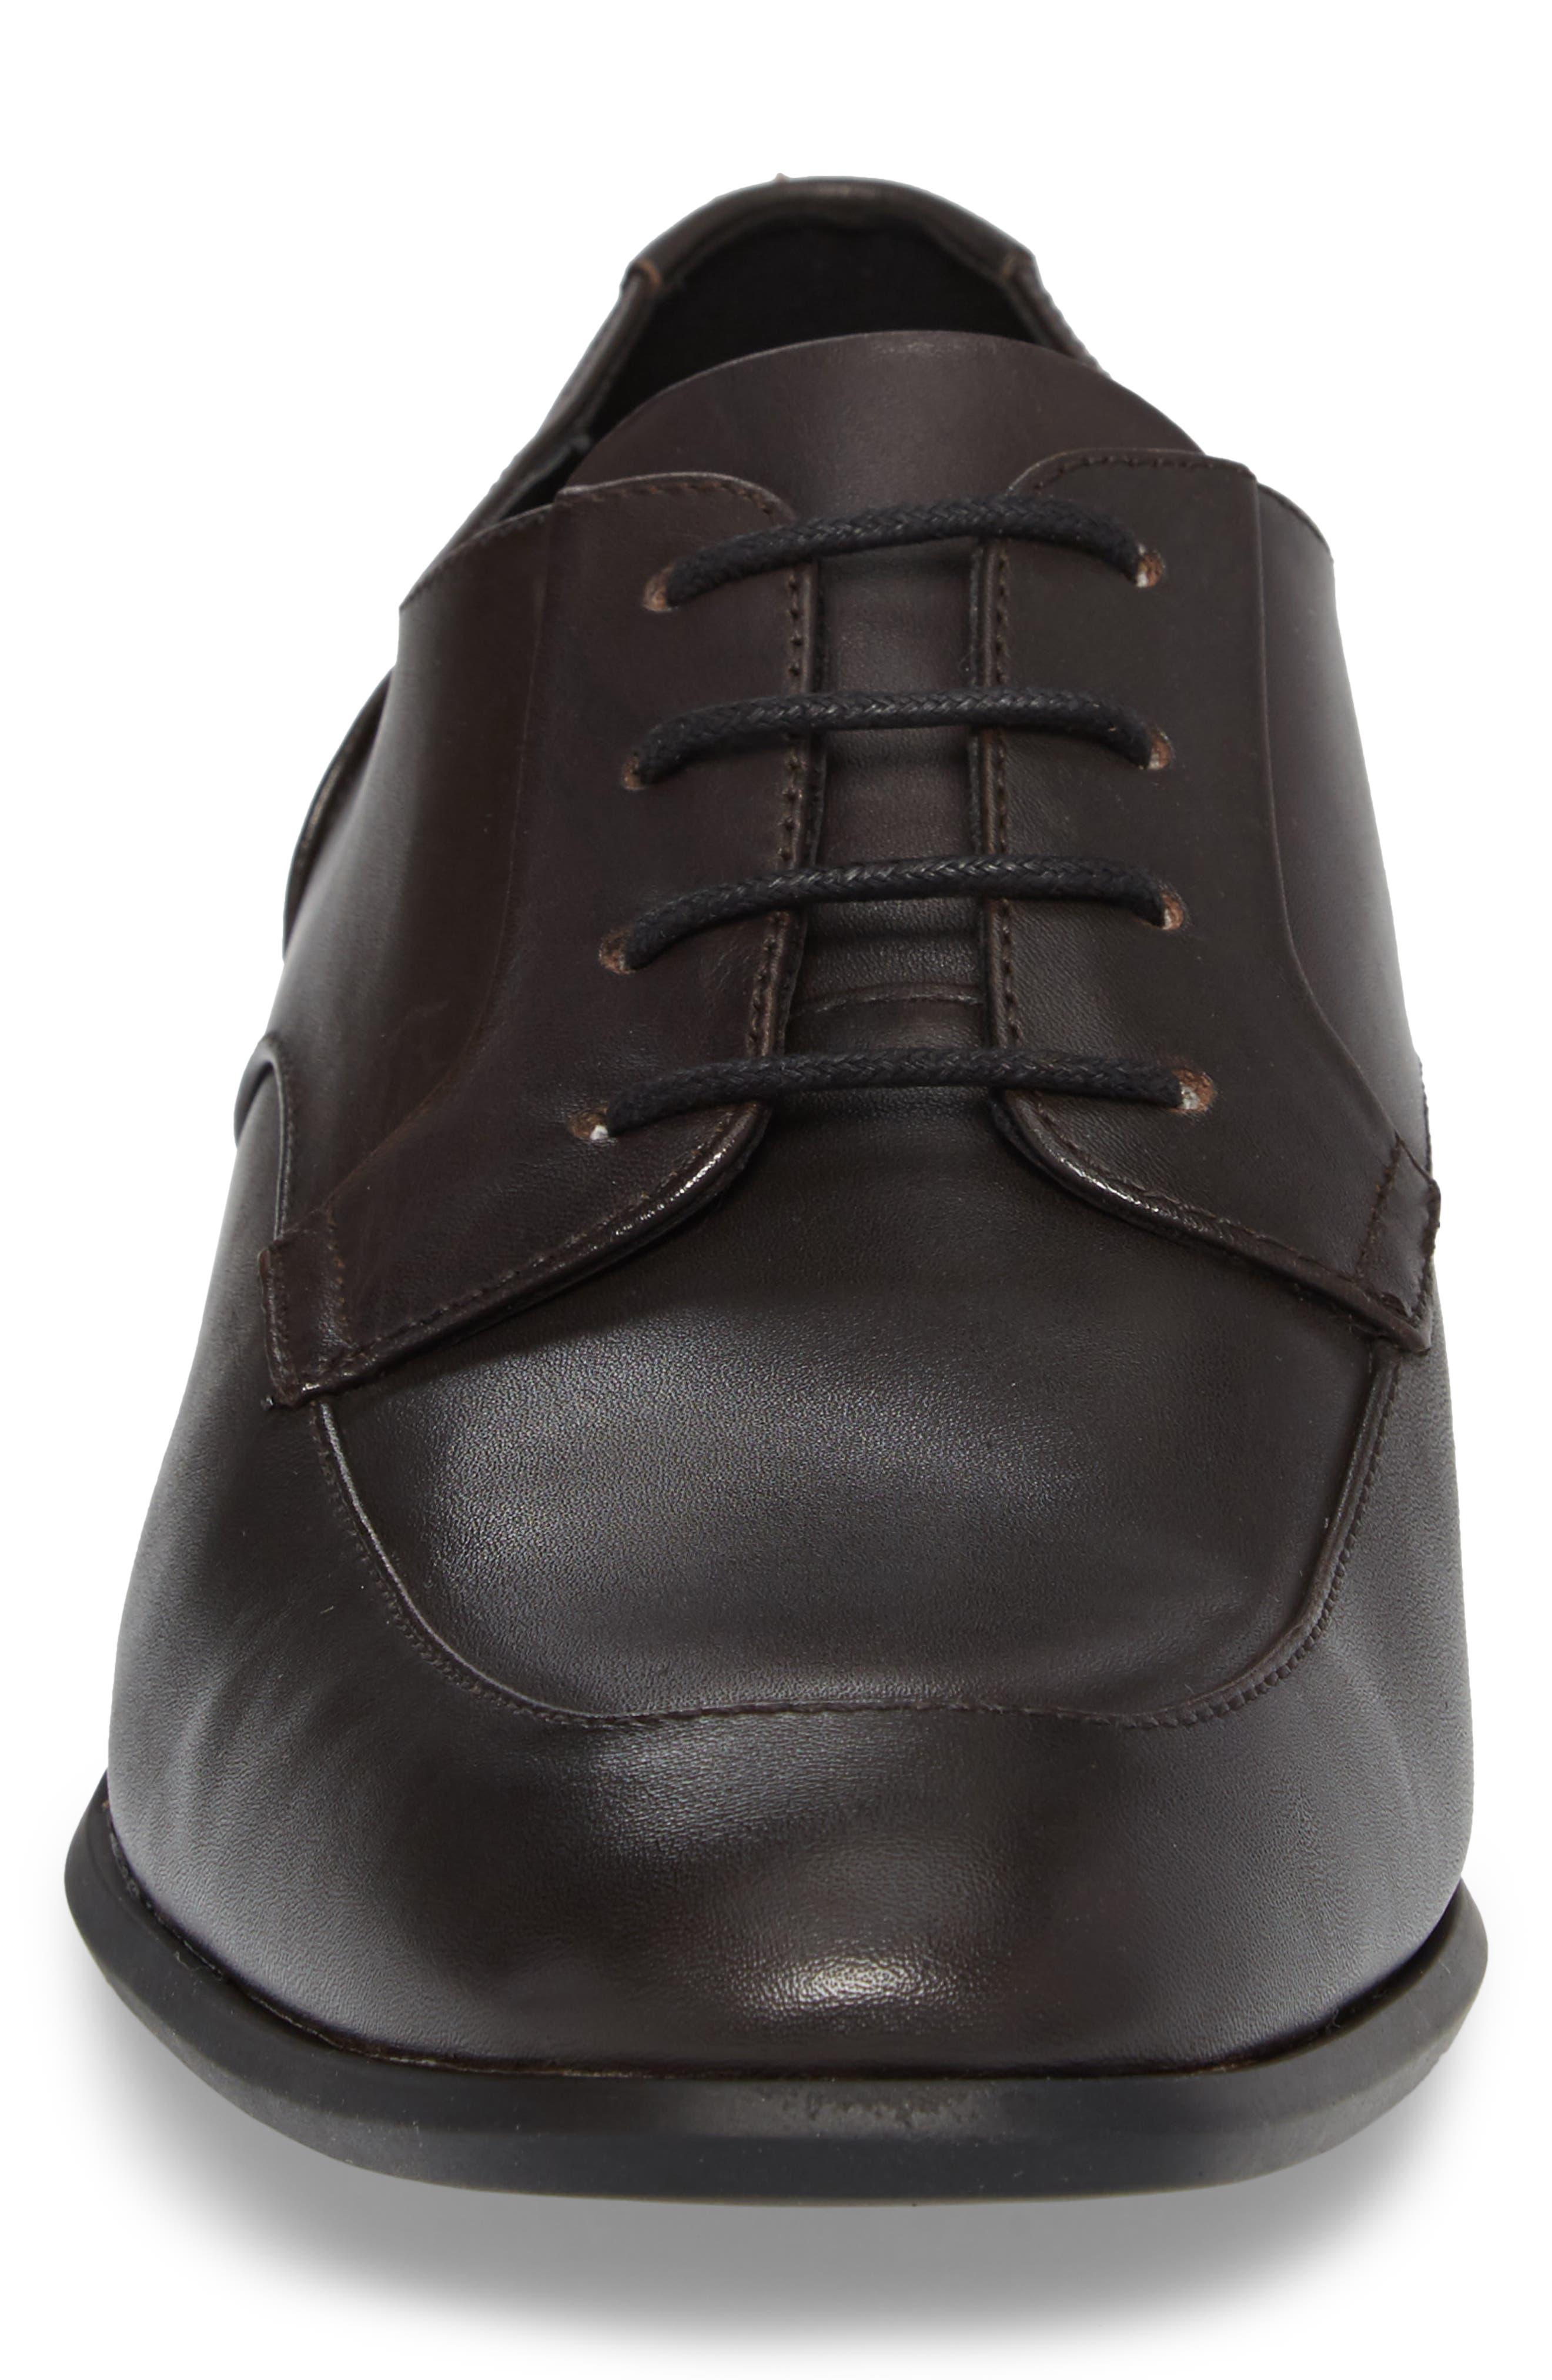 Lazarus Apron Toe Derby,                             Alternate thumbnail 4, color,                             Dark Brown Leather